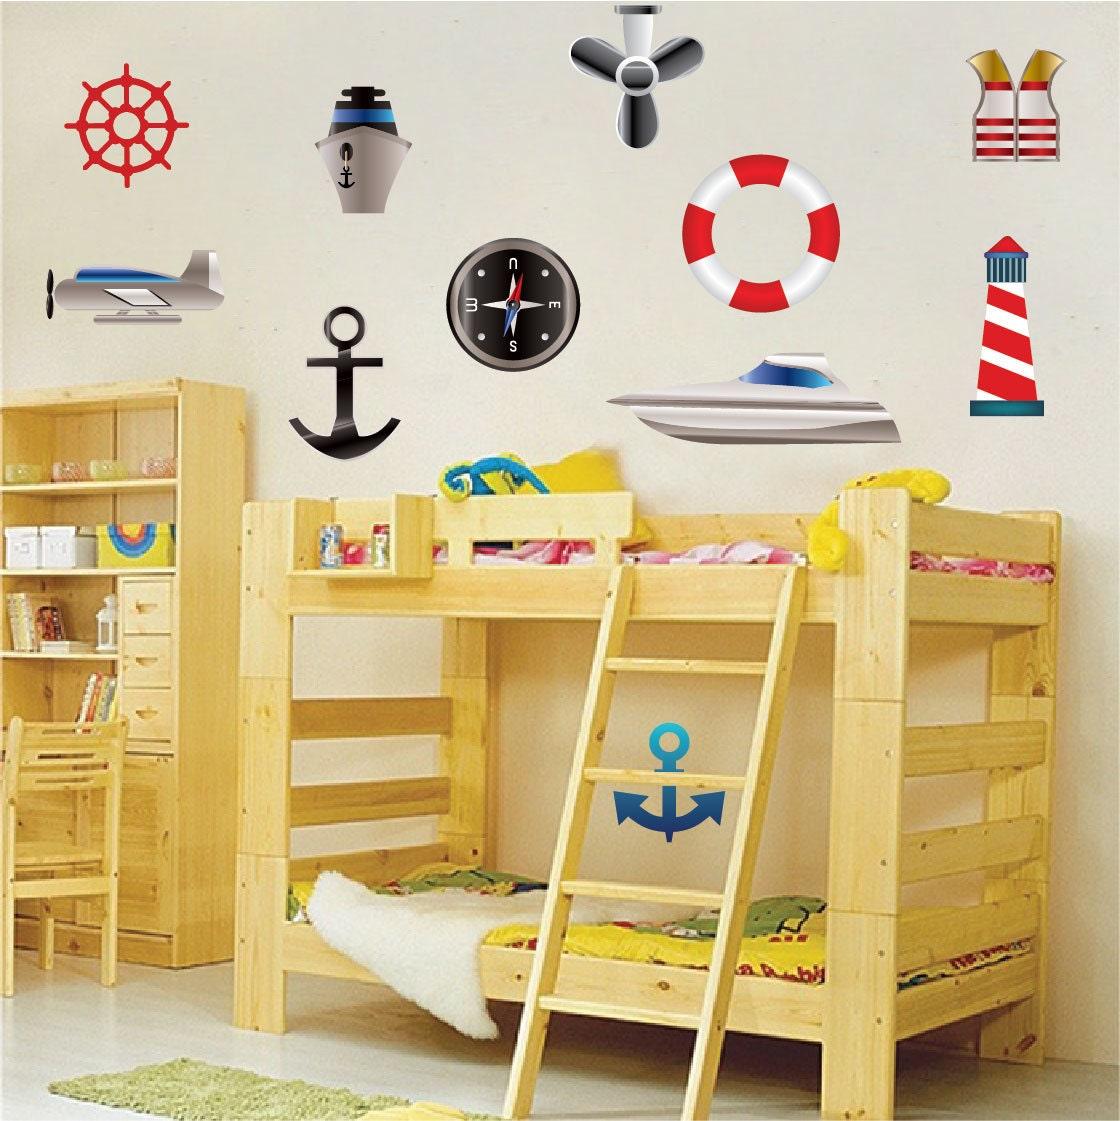 Sailor Decals Kids Sailor Bedroom Decor Boys Room Decals   Etsy